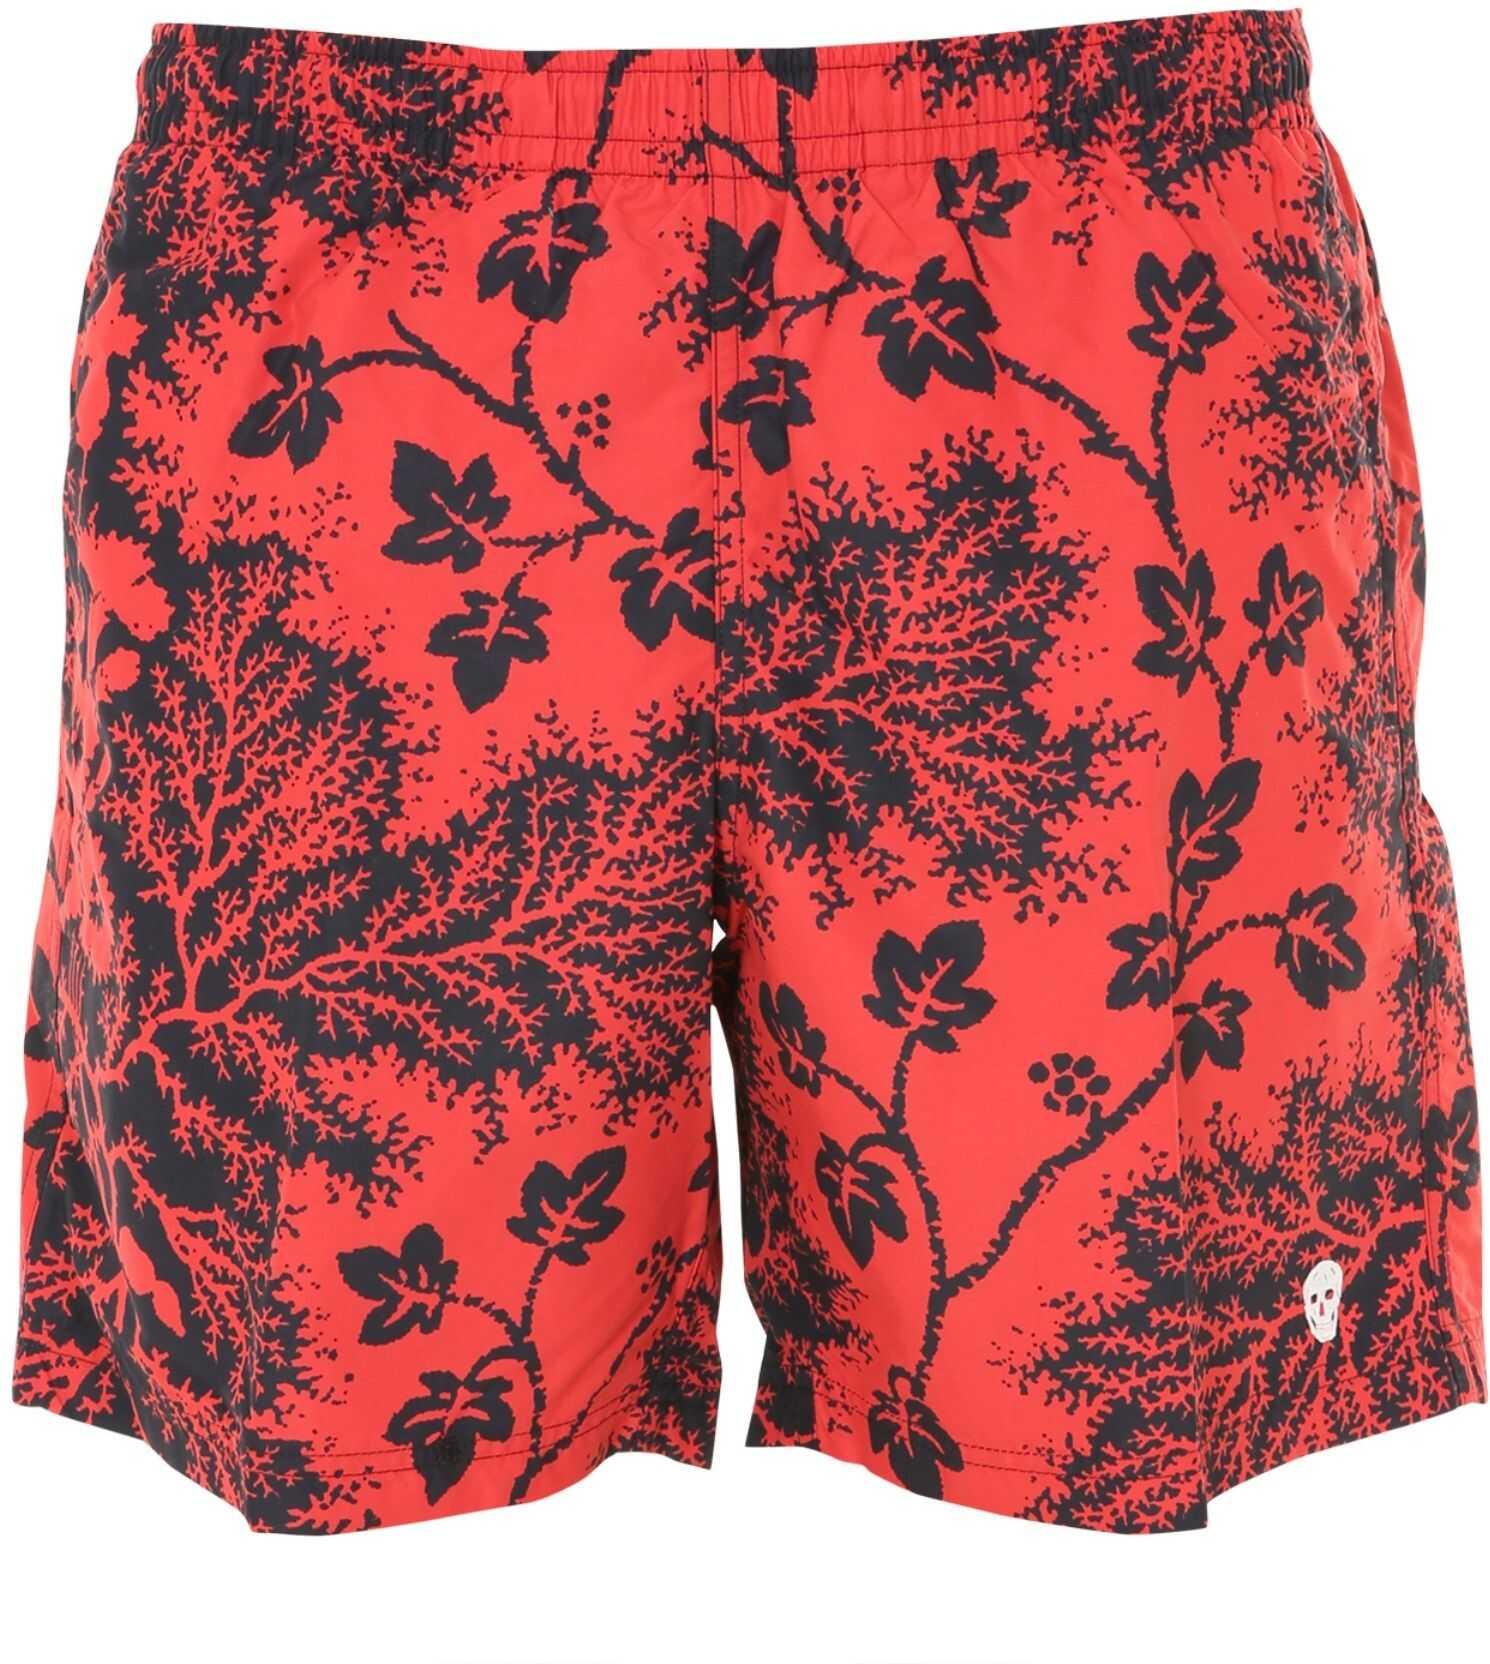 Alexander McQueen Medium Swimsuit RED